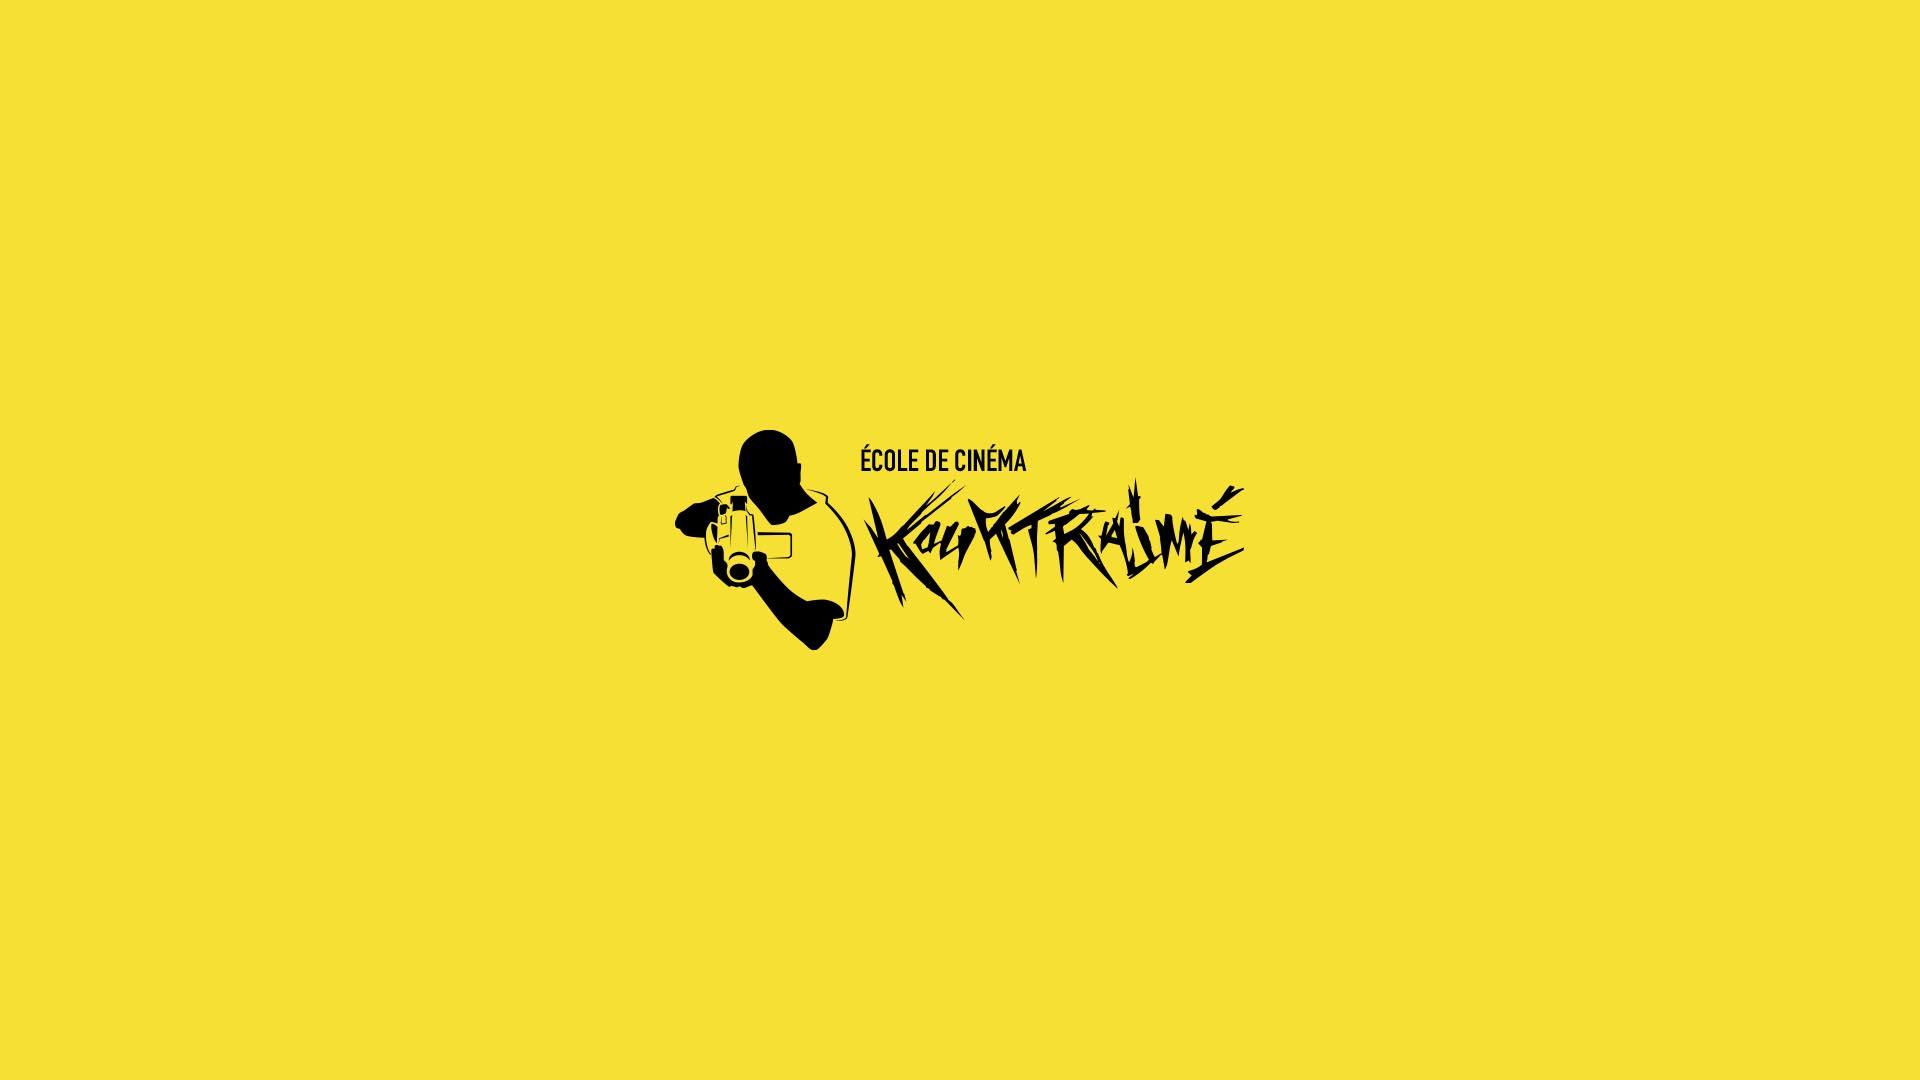 logo ecole kourtrajmé jaune / %sitename